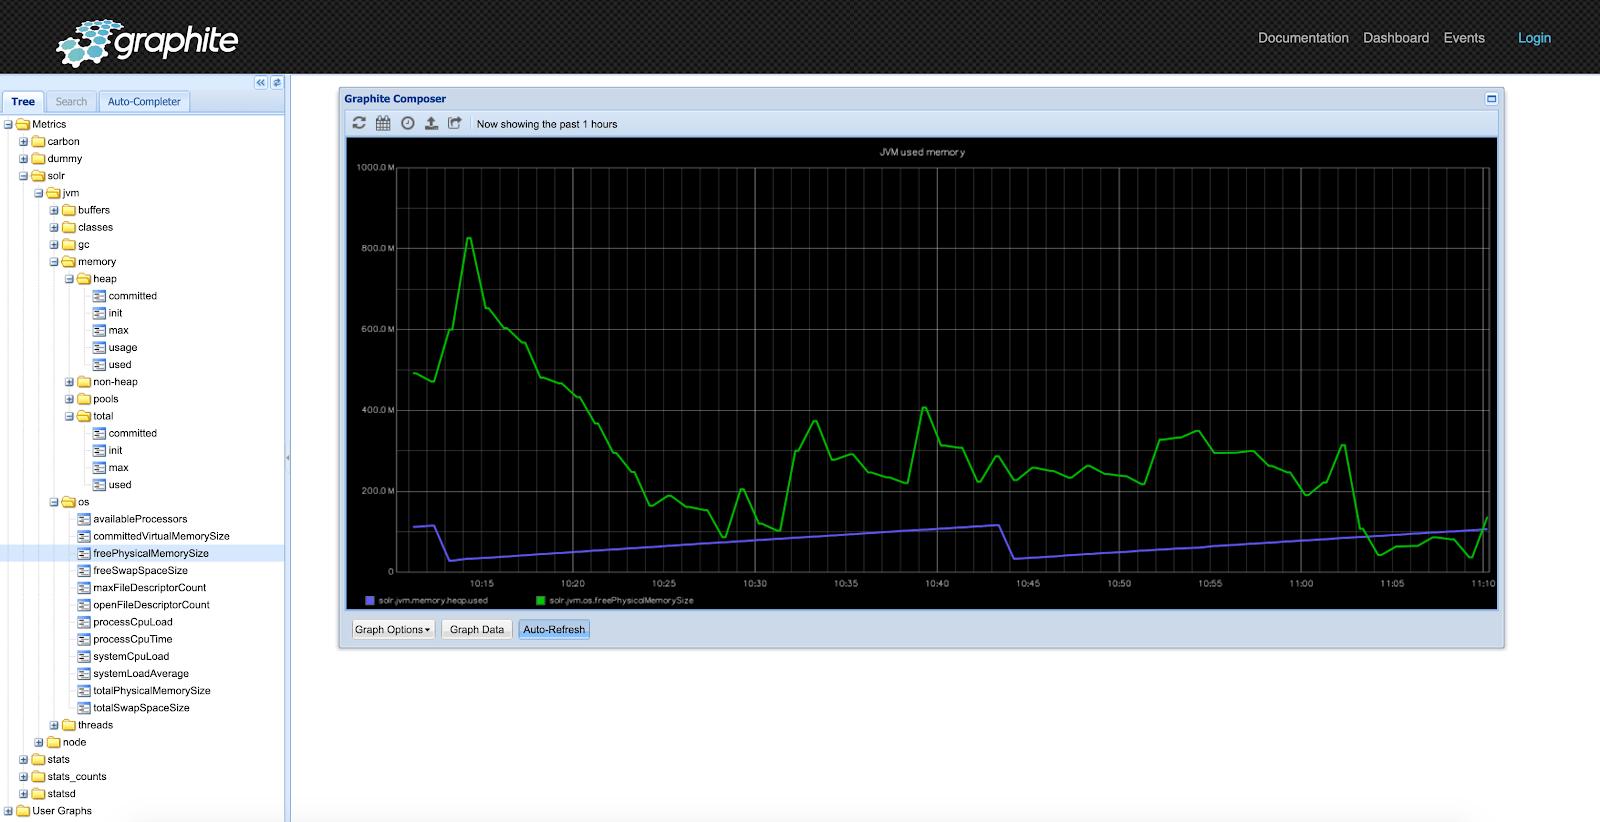 Monitoring Tools Graphite